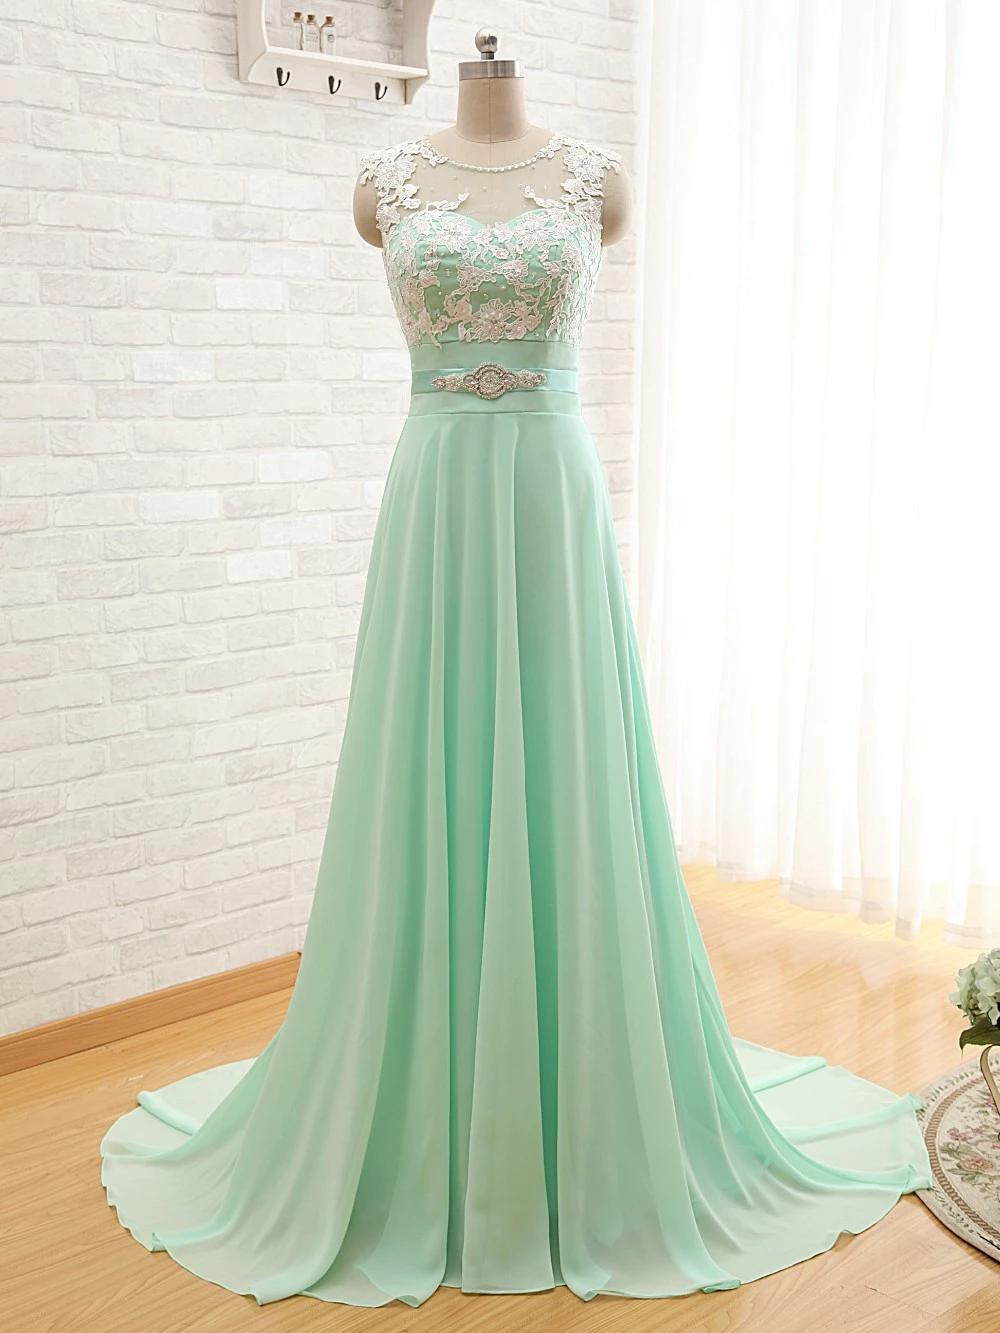 Beautiful Mint Green Long Chiffon Party Dress Charming Bridesmaid Dress Mint Green Prom Dress Long Bridesmaid Dresses Green Prom Dress [ 1333 x 1000 Pixel ]